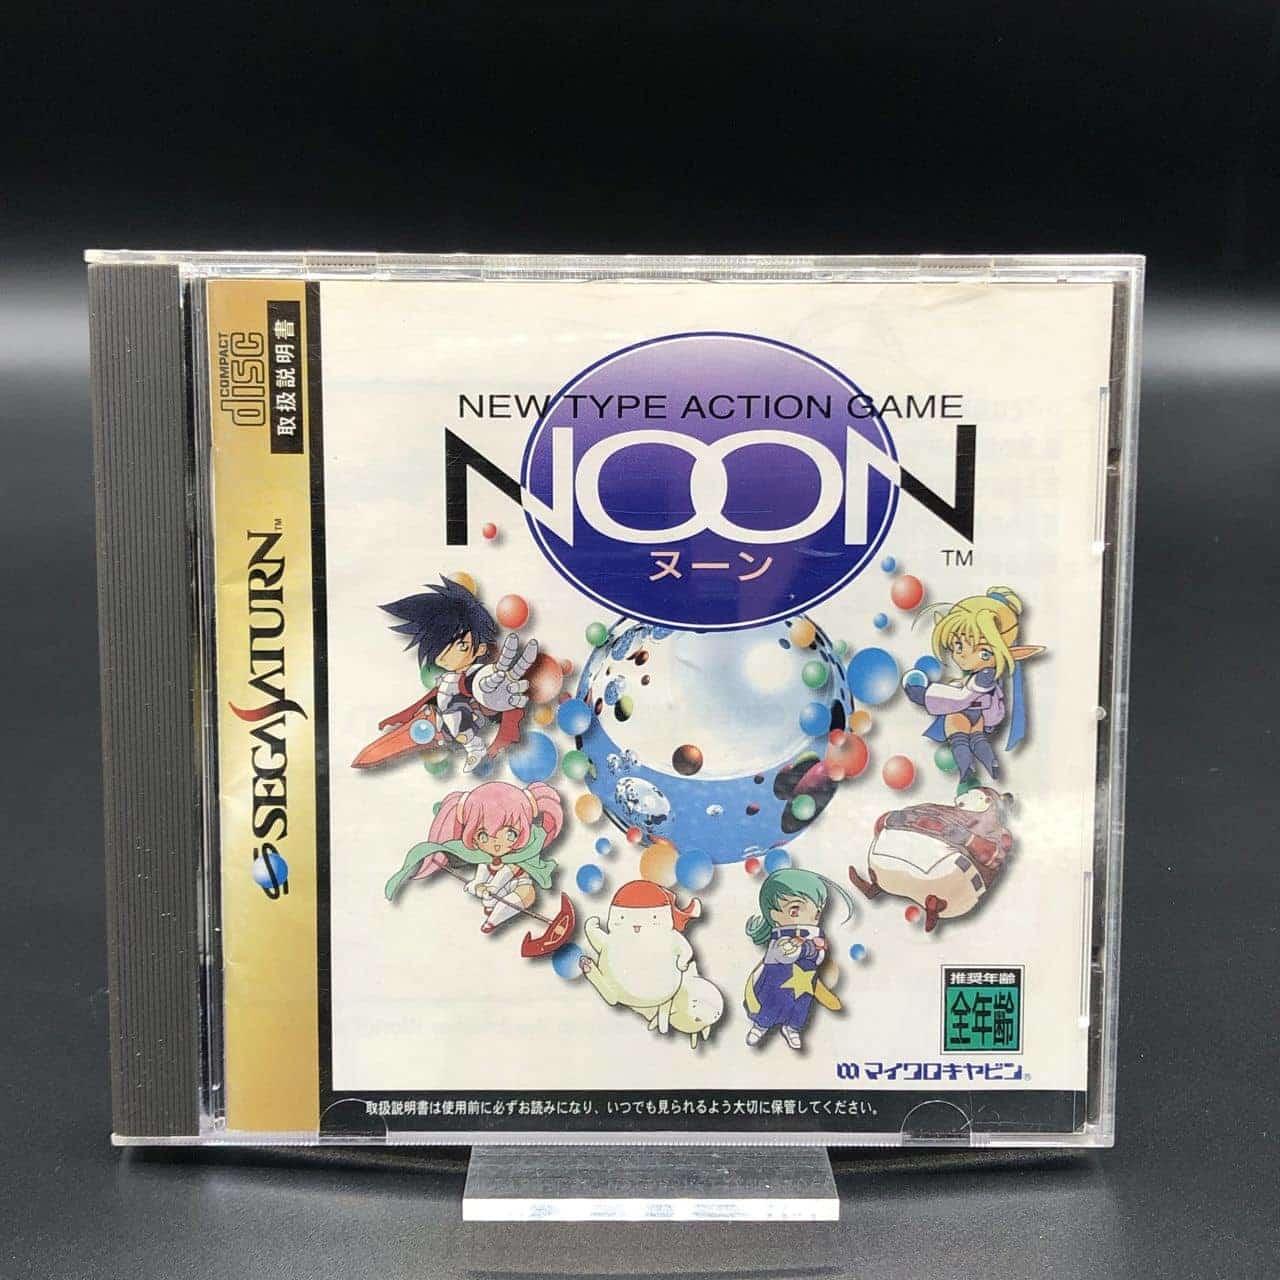 New Type Action Game - Noon (Import Japan) (Komplett) (Sehr gut) Sega Saturn